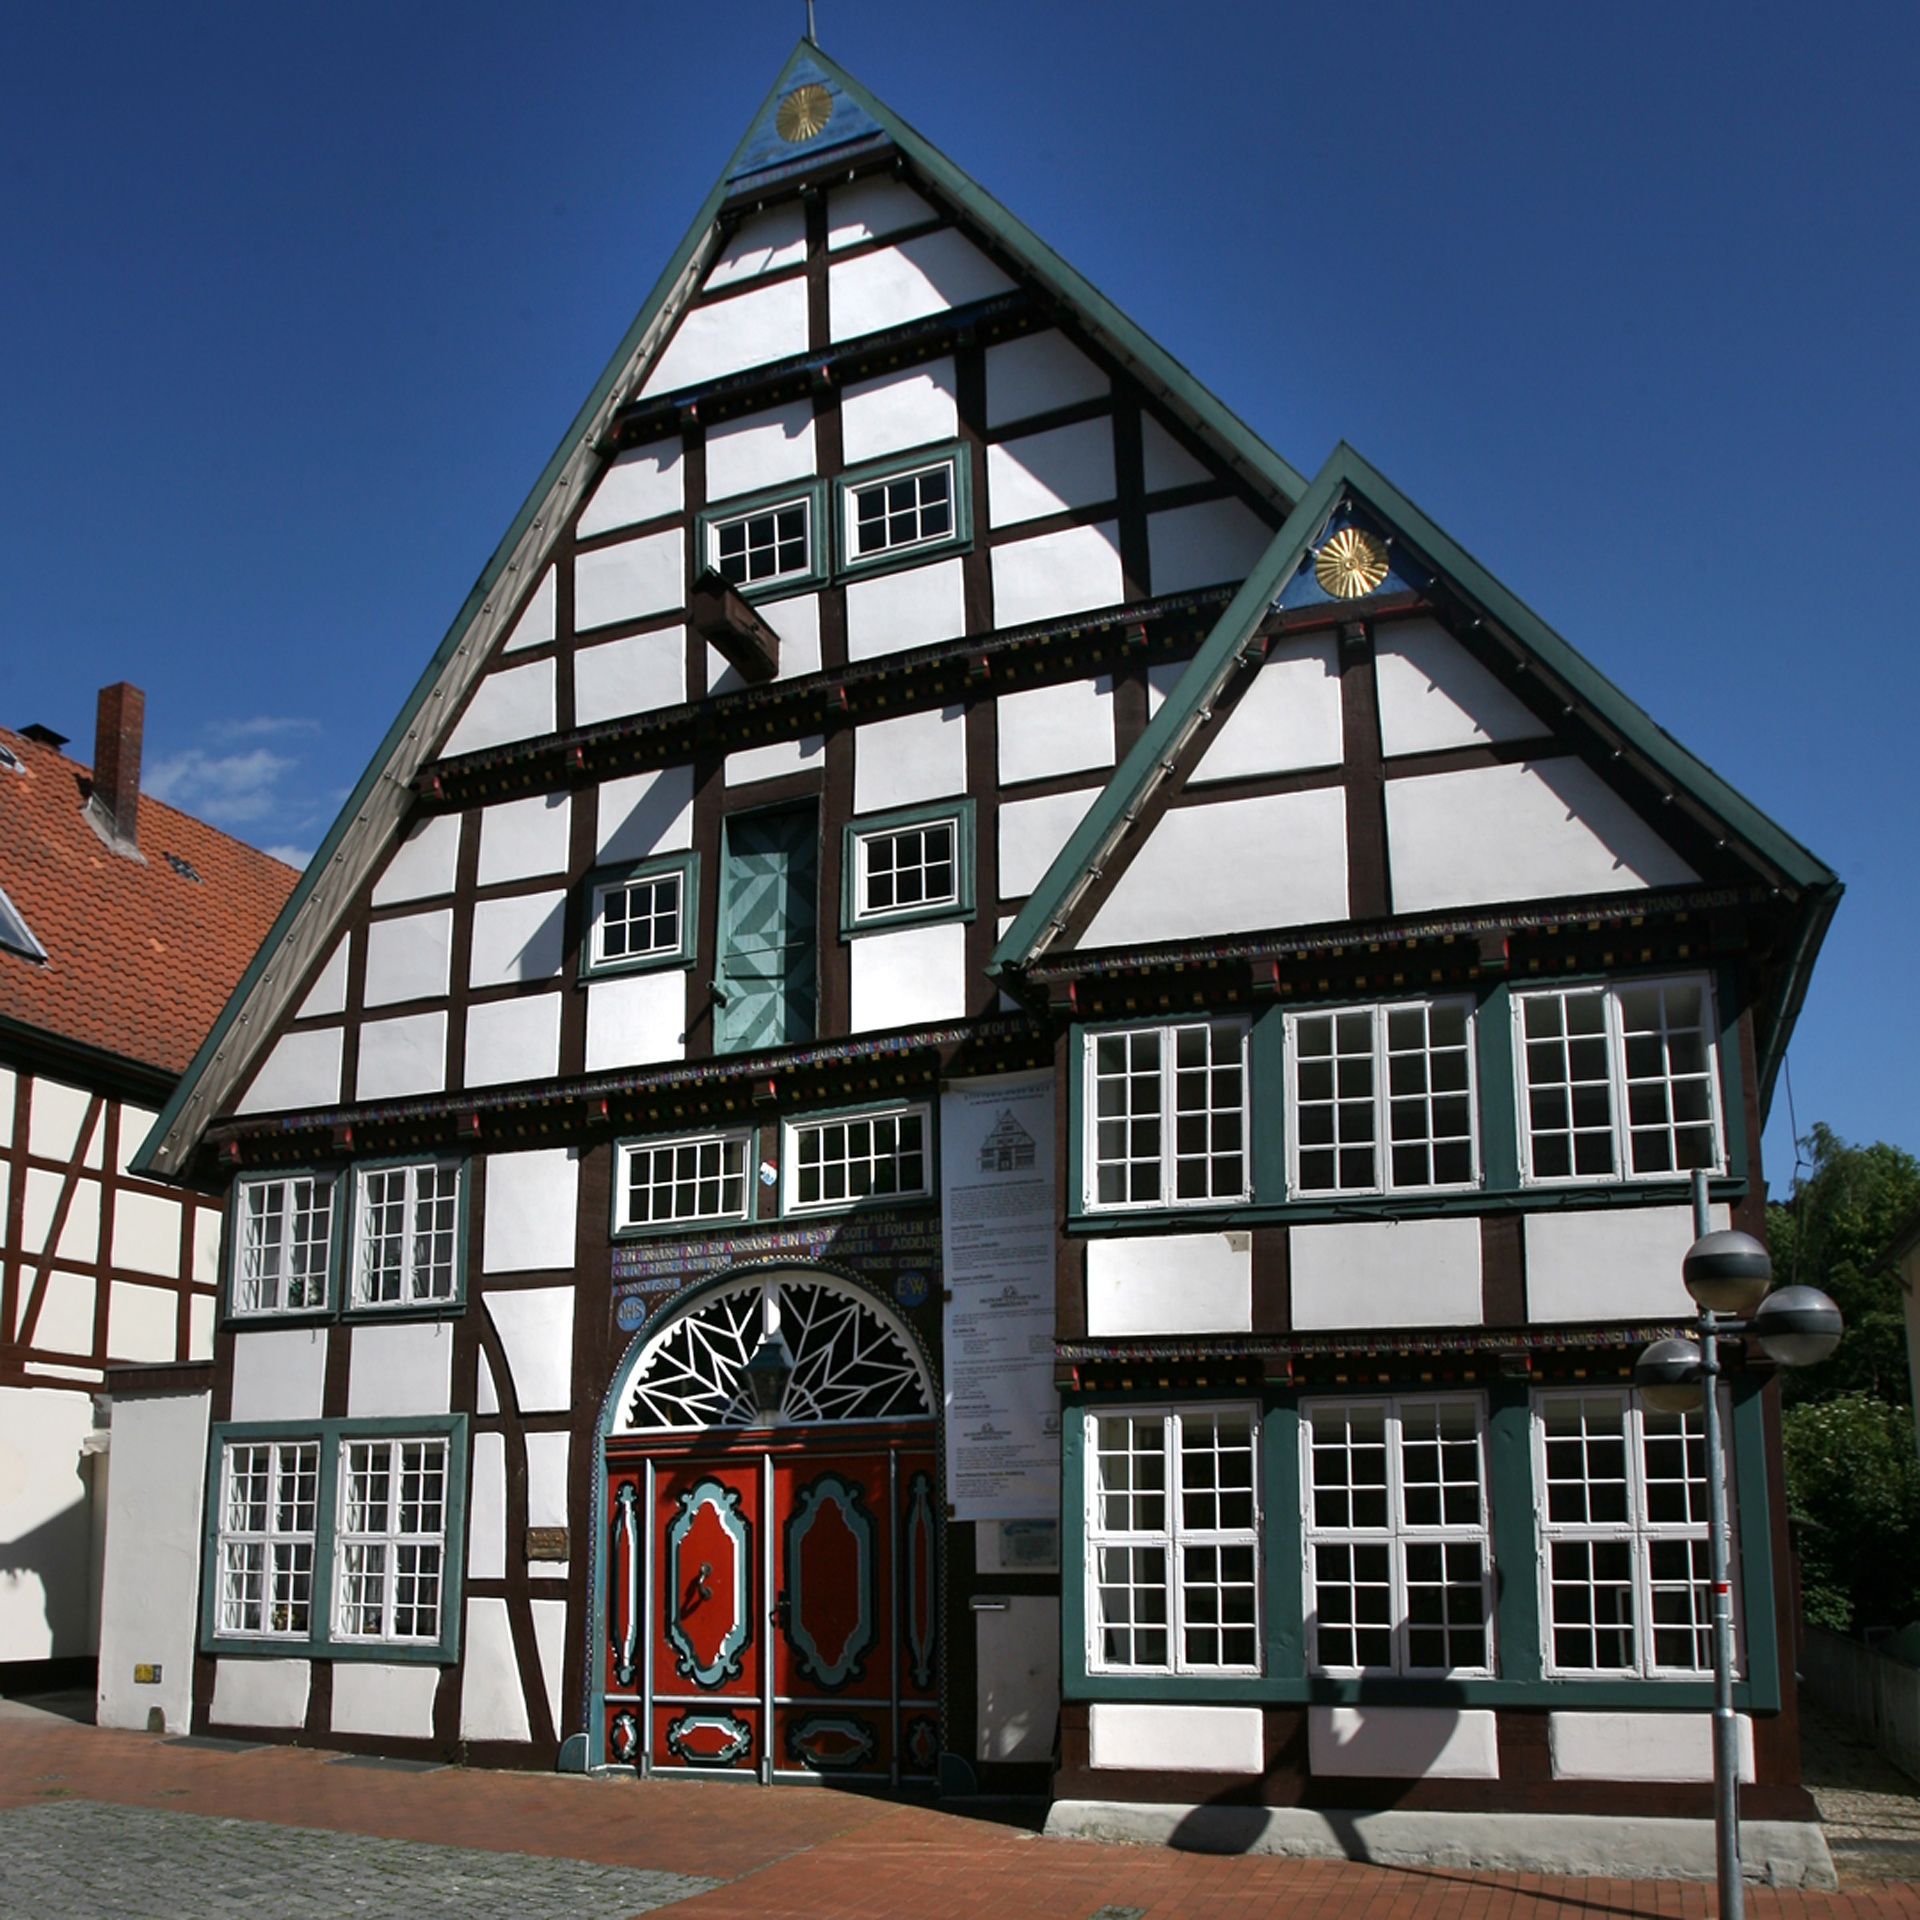 Das Haus Malz